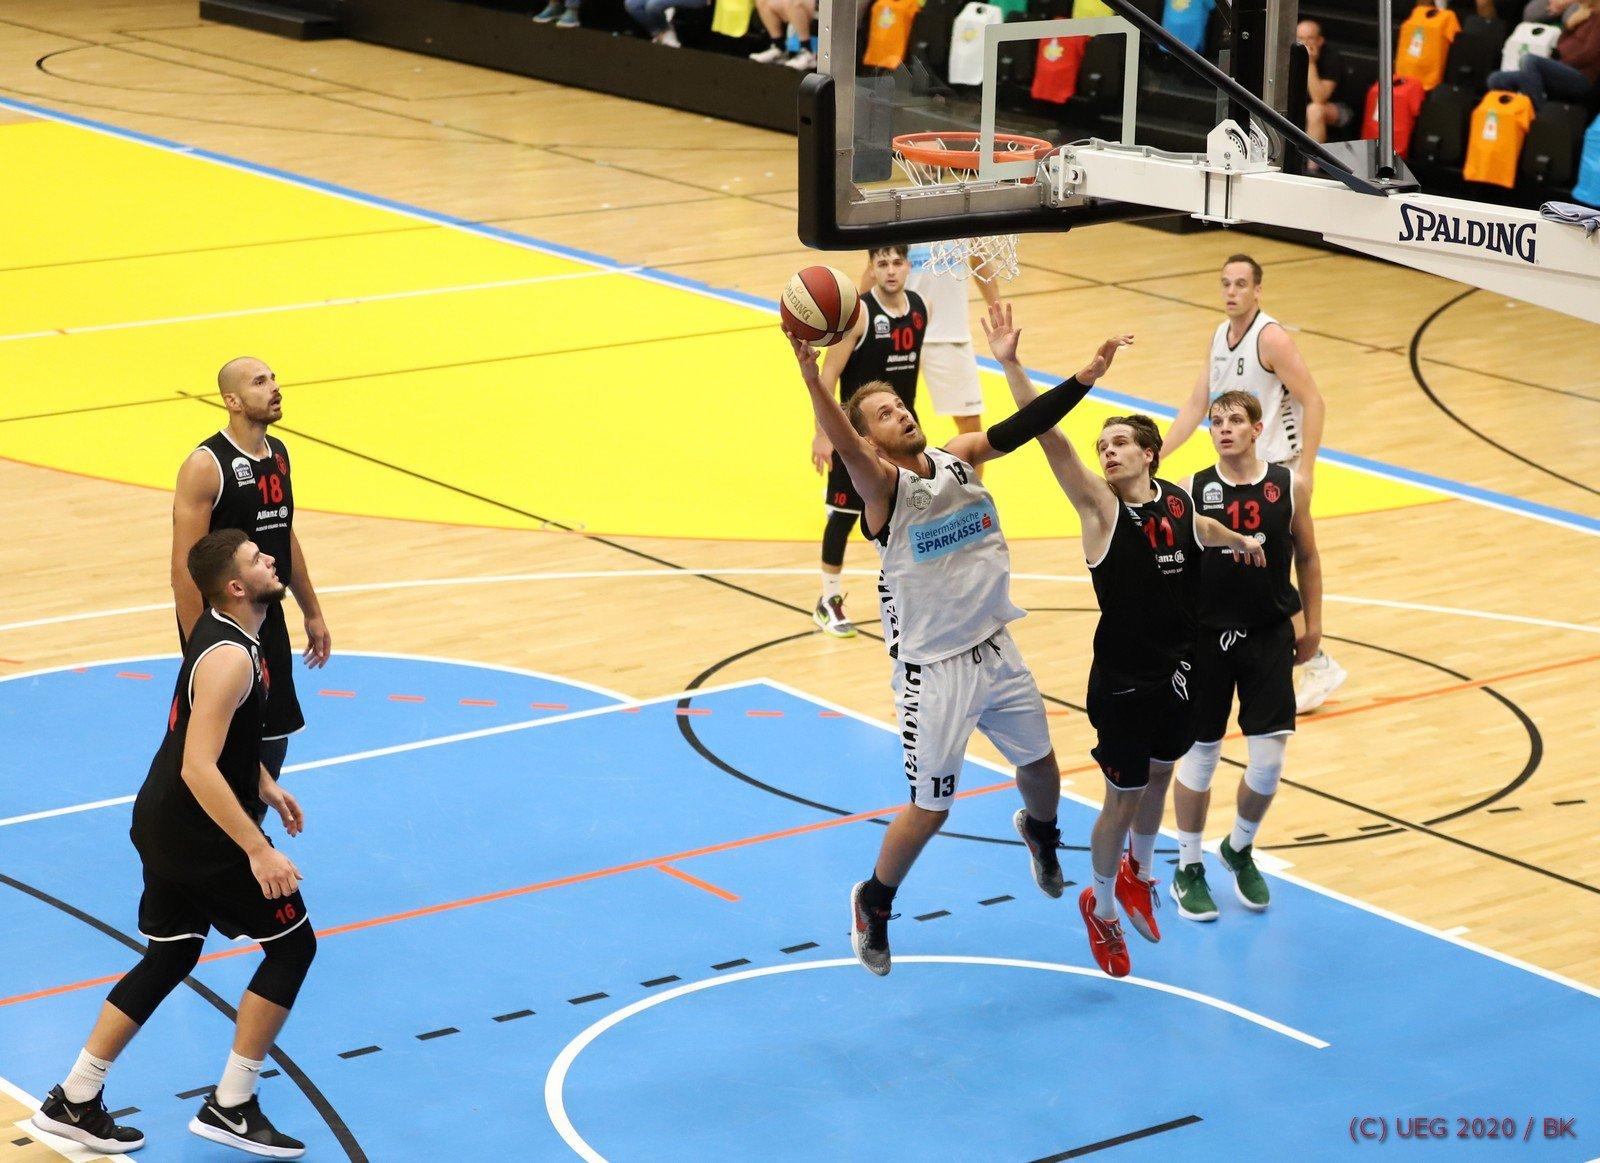 19.09.20, Graz, Austria, BASKETBALL, Basketball Austria Cup, Vorrunde, UEG vs. Mistelbach Mustangs